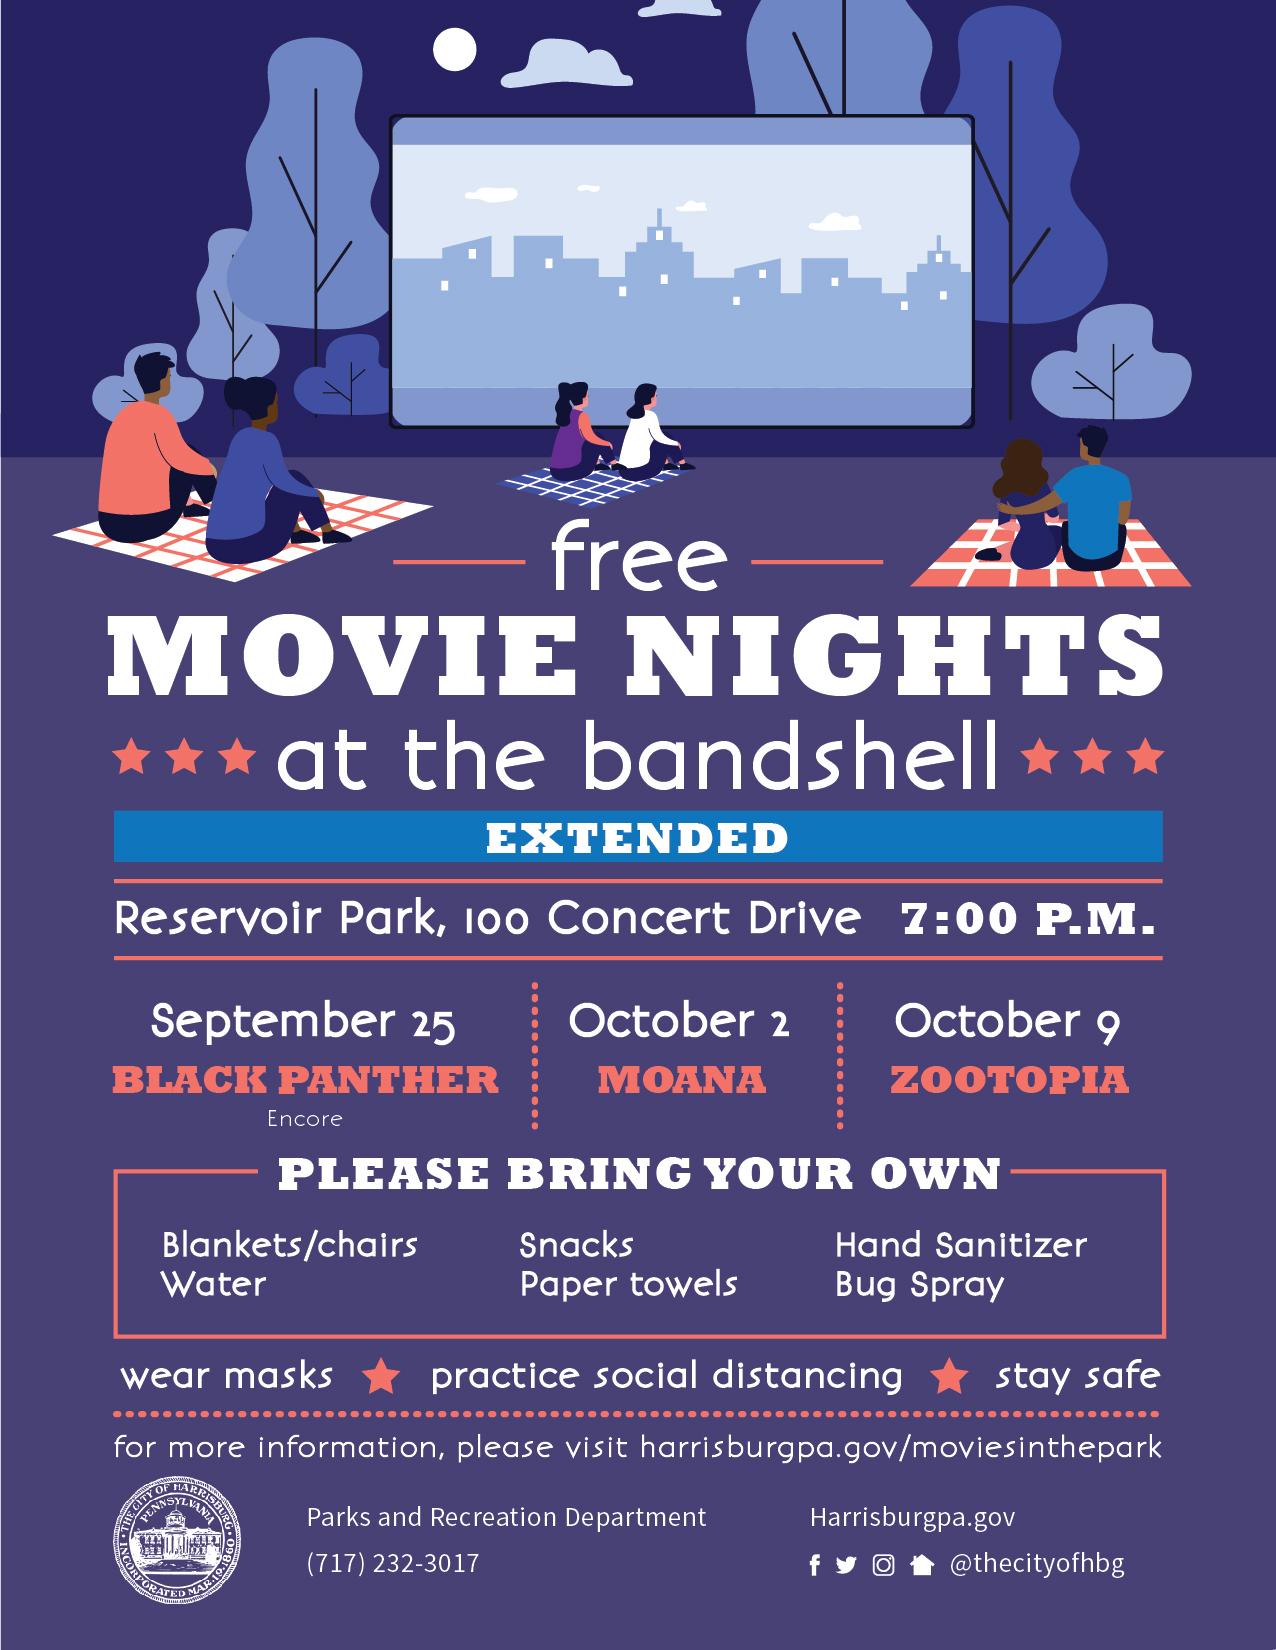 Movie night extended